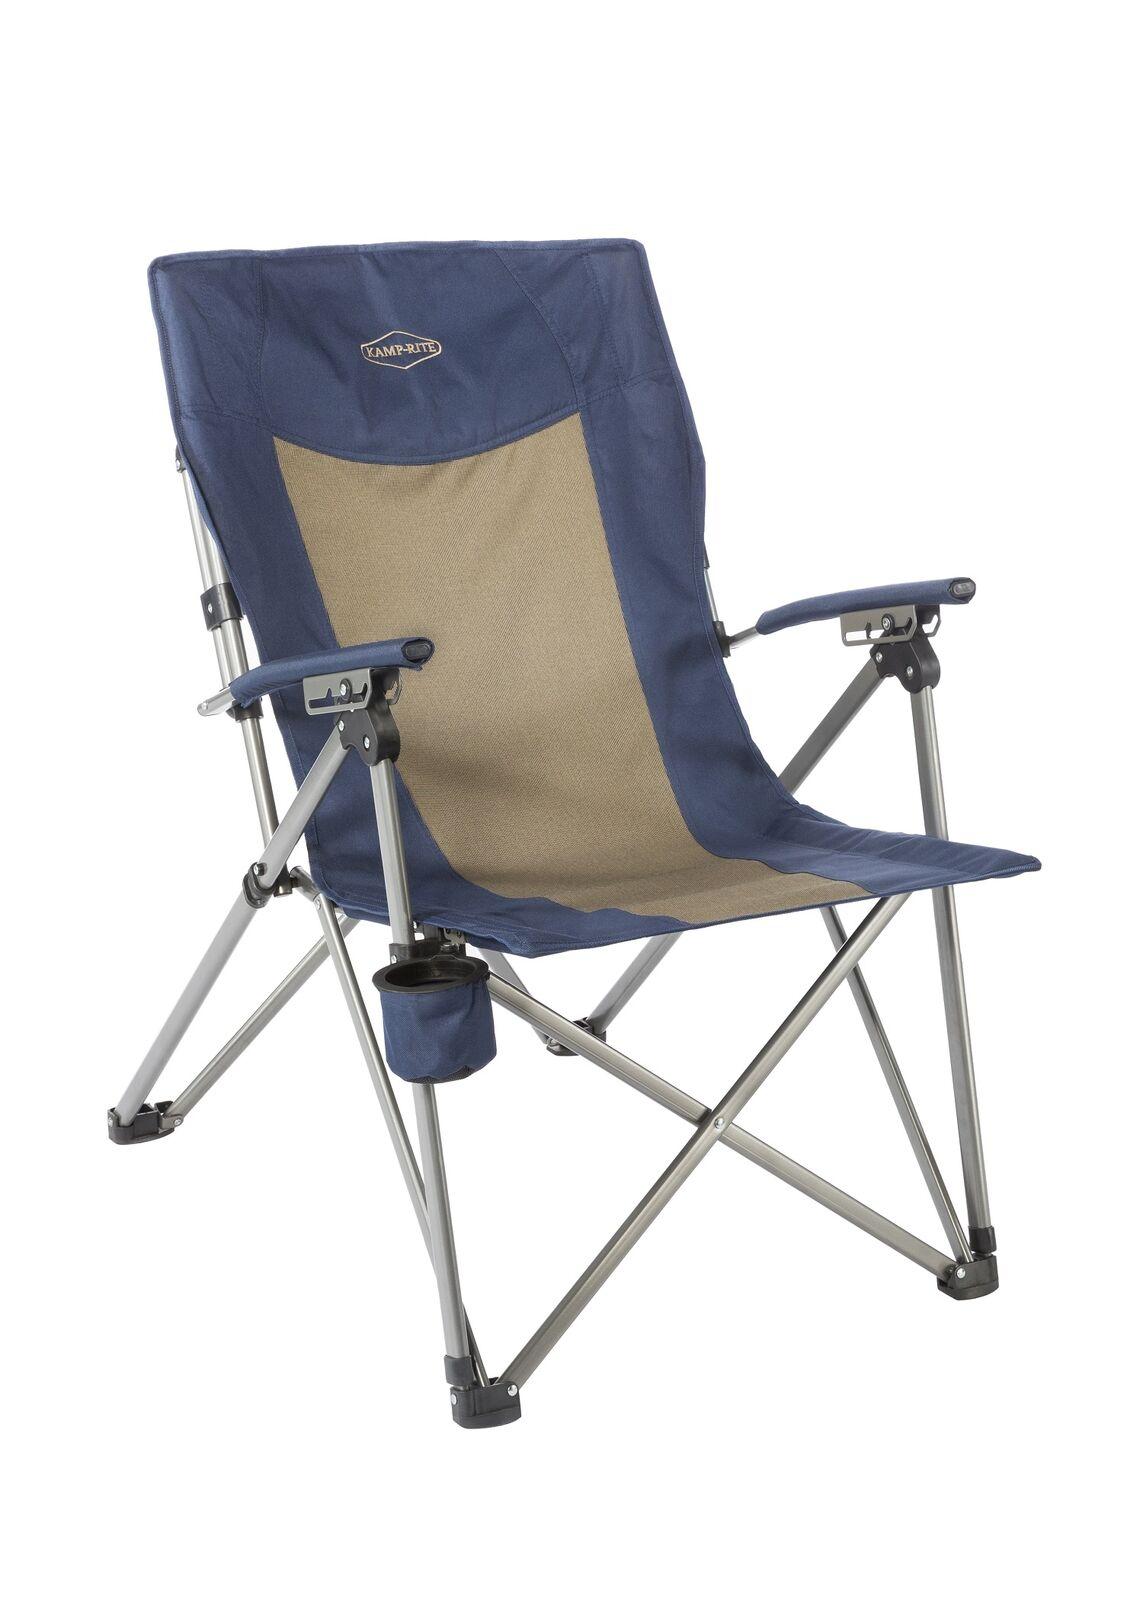 3 Position Hard Arm Reclining Chair